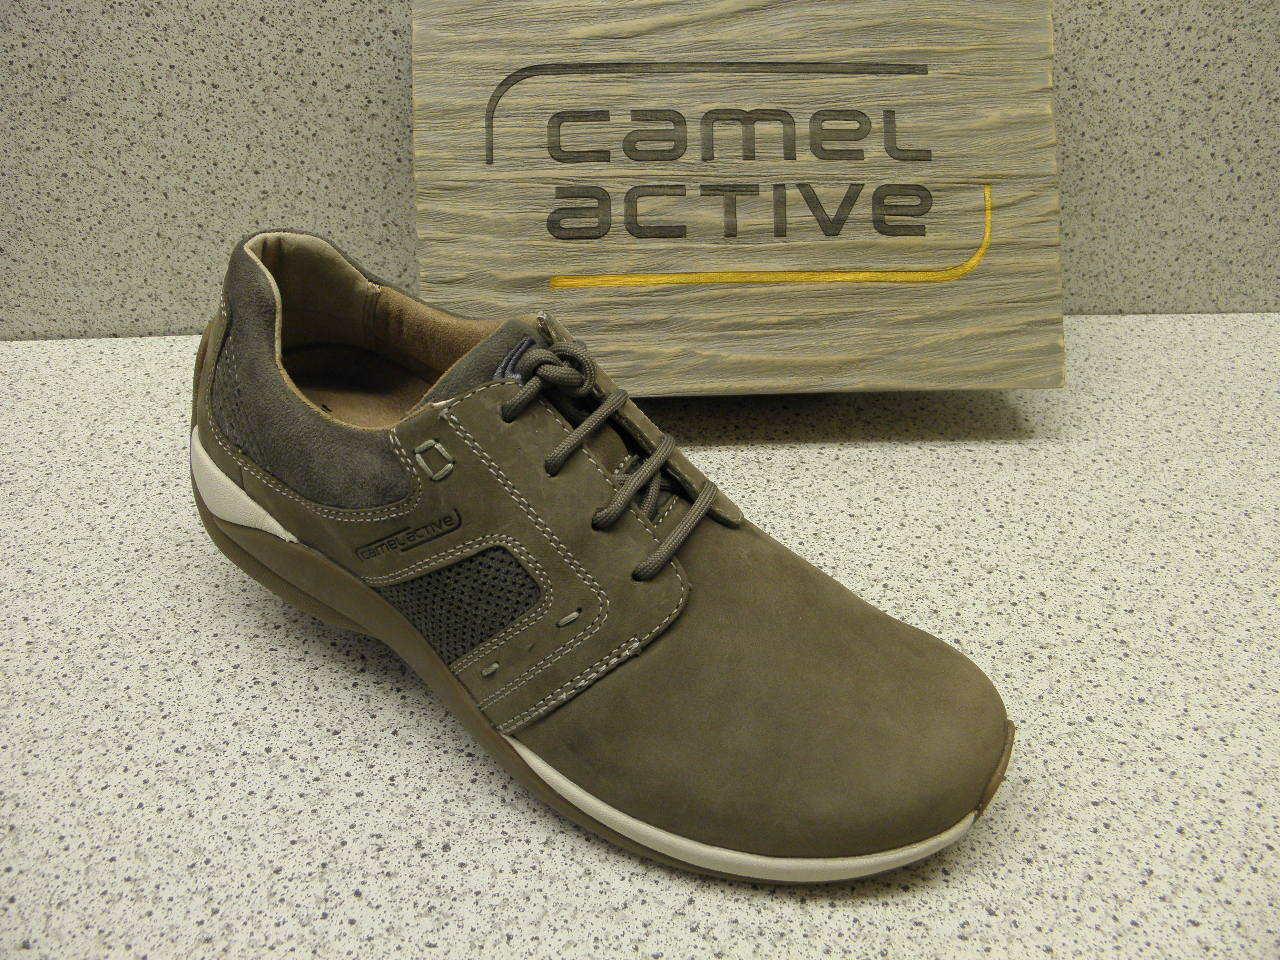 camel active ® reduziert   bisher 119,95   reduziert Moonlight grau braun Sneaker (C62) 7a5749